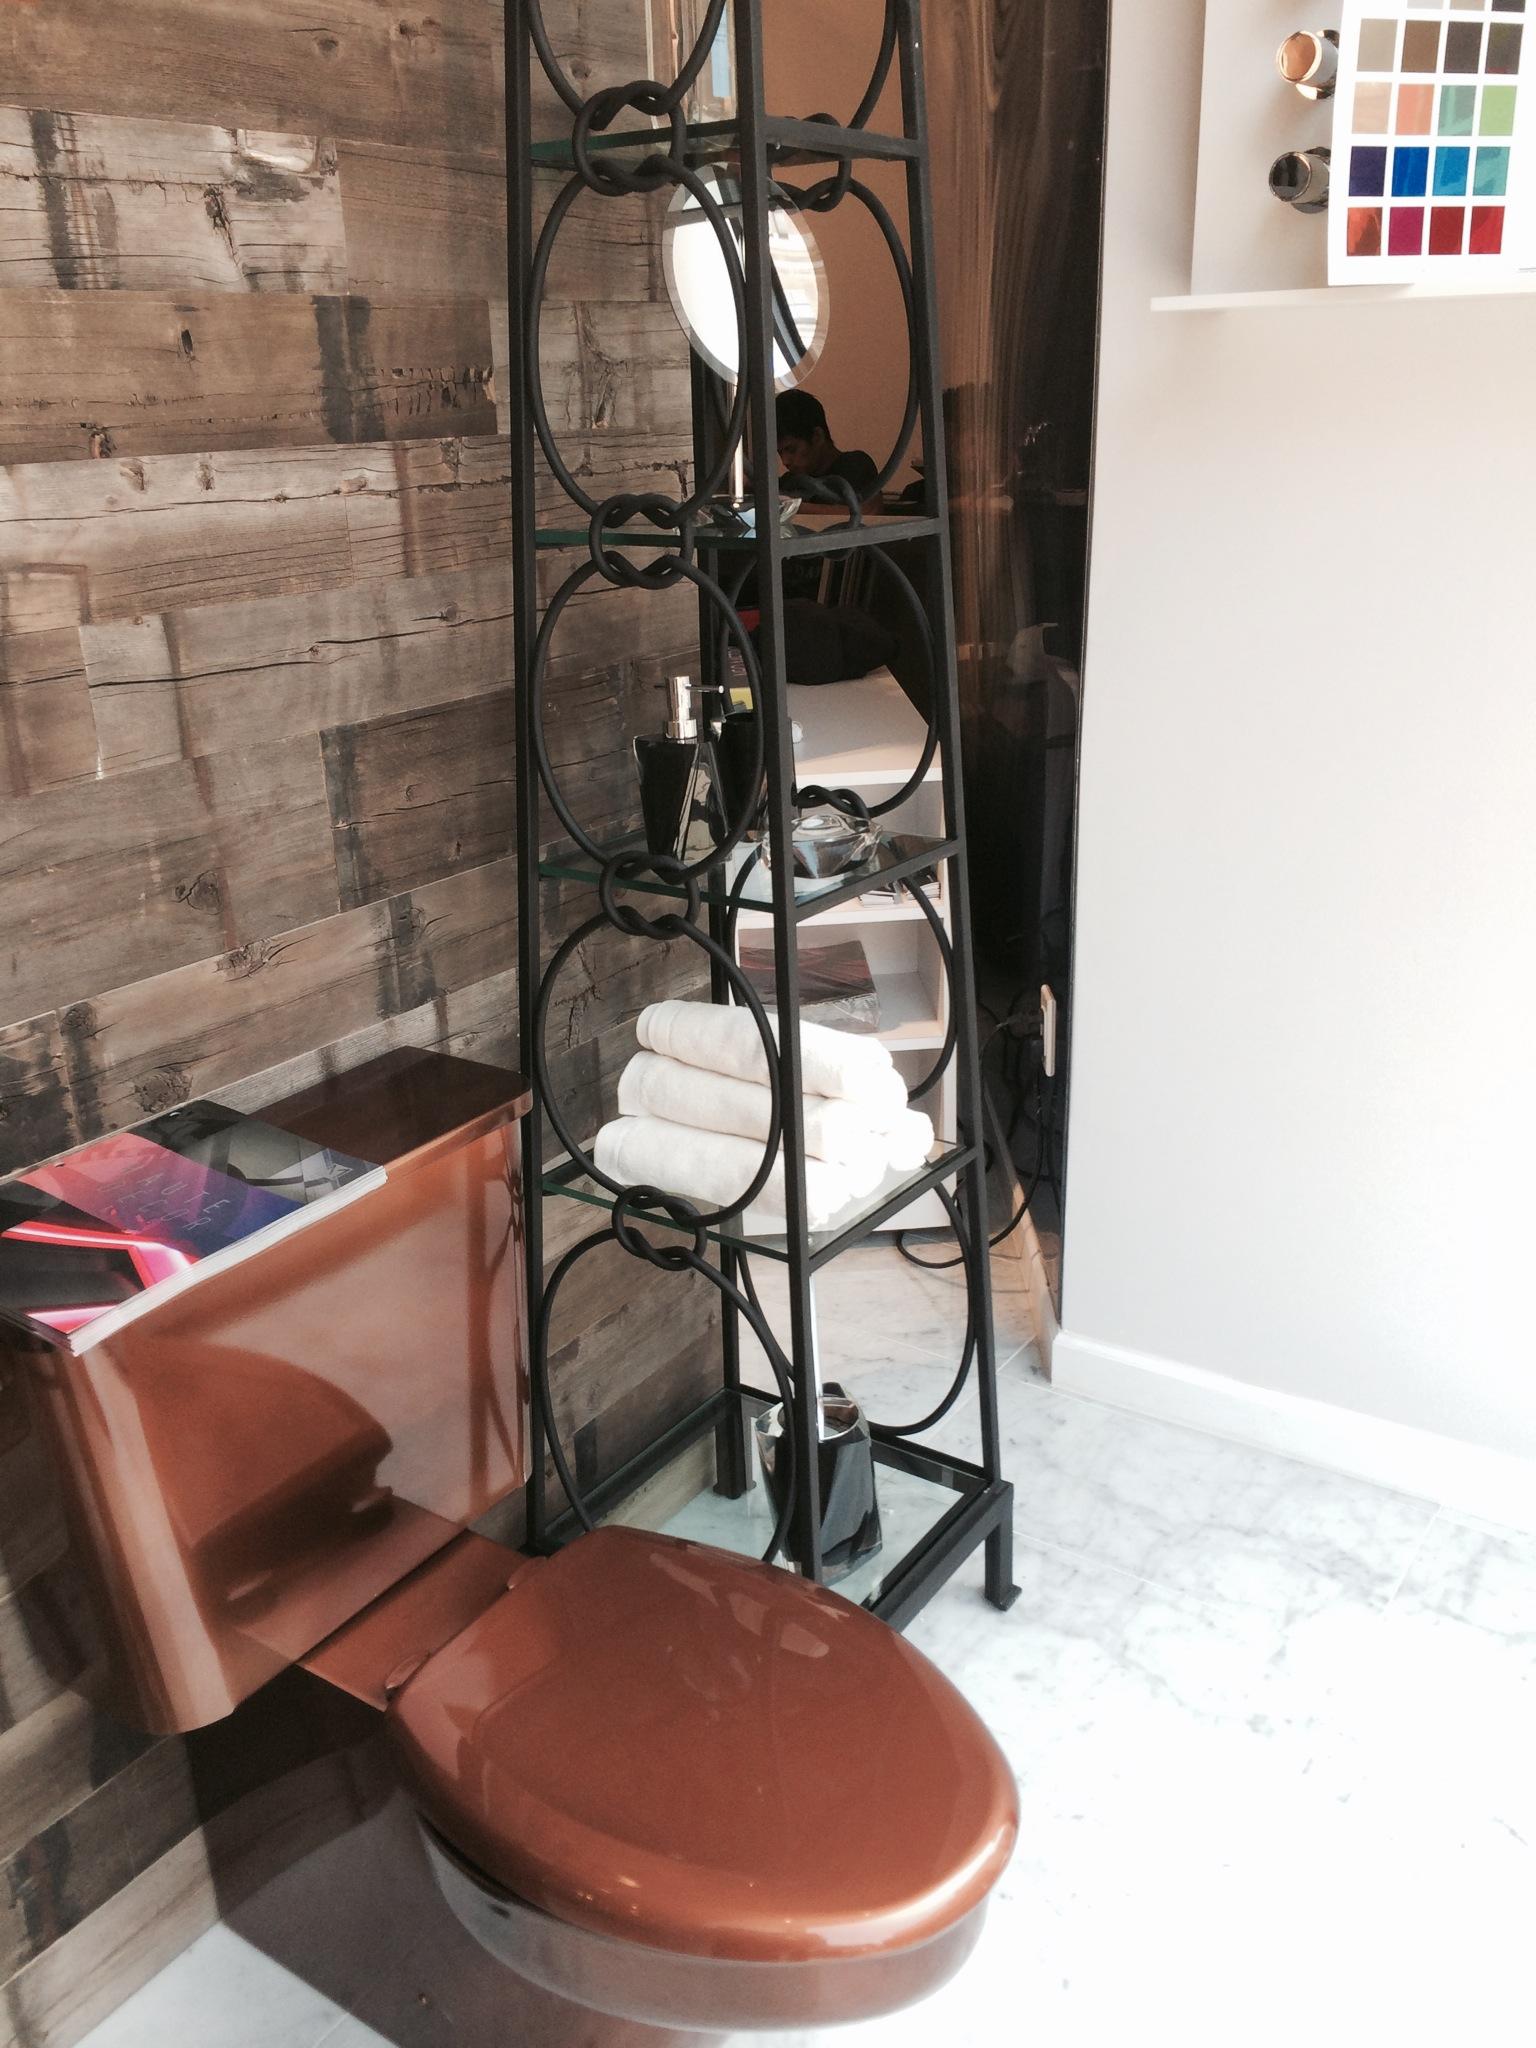 ... Neo Metro Toilet Installation In The Grande Central Plumbing Supply  Showroom In ...